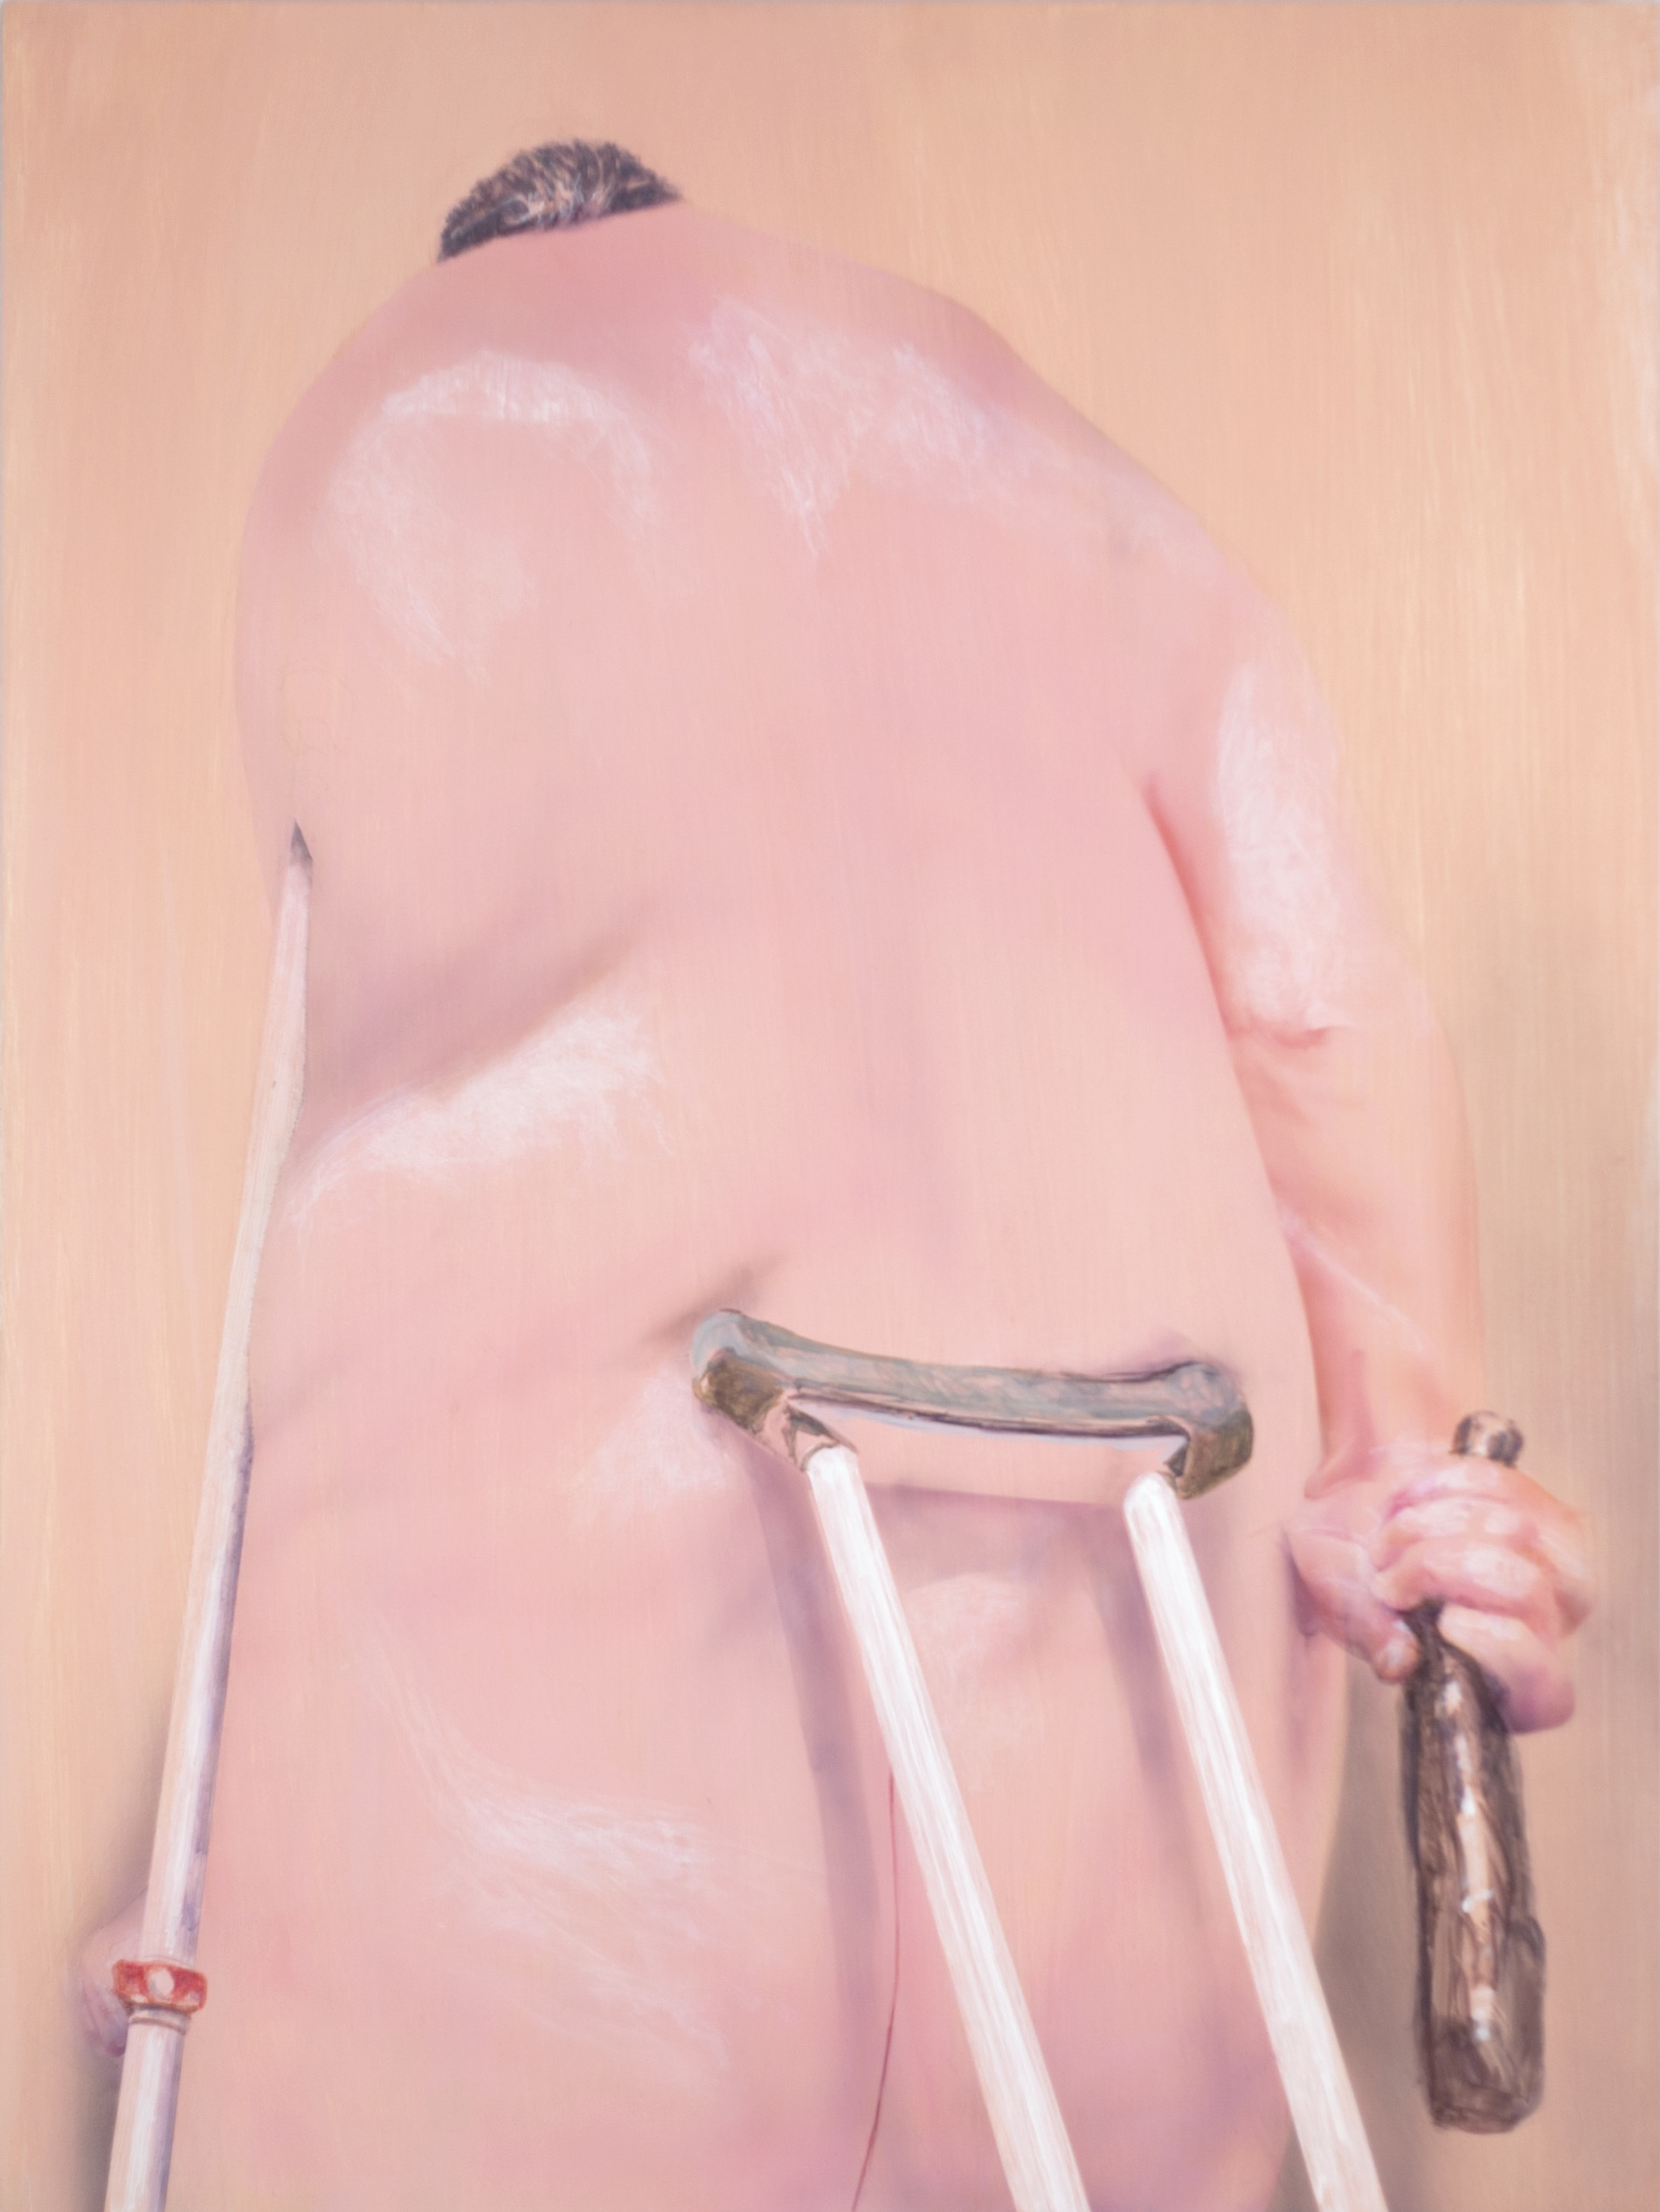 Robert Feintuch  Fat Hercules,  2011 Polymer emulsion on honeycomb panel 30h x 22.5w in.